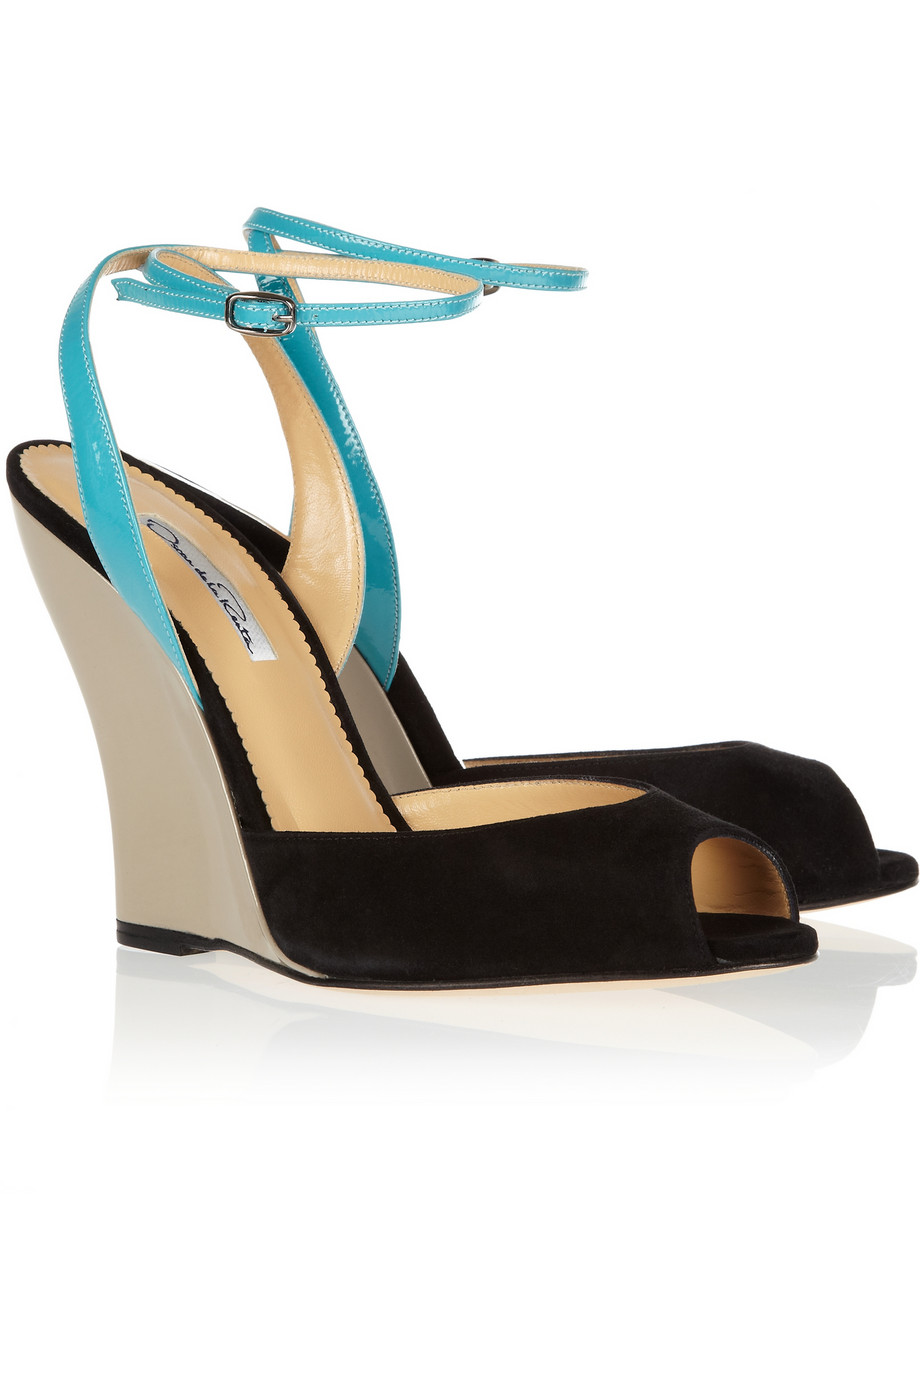 Black Patent Wedge Heels